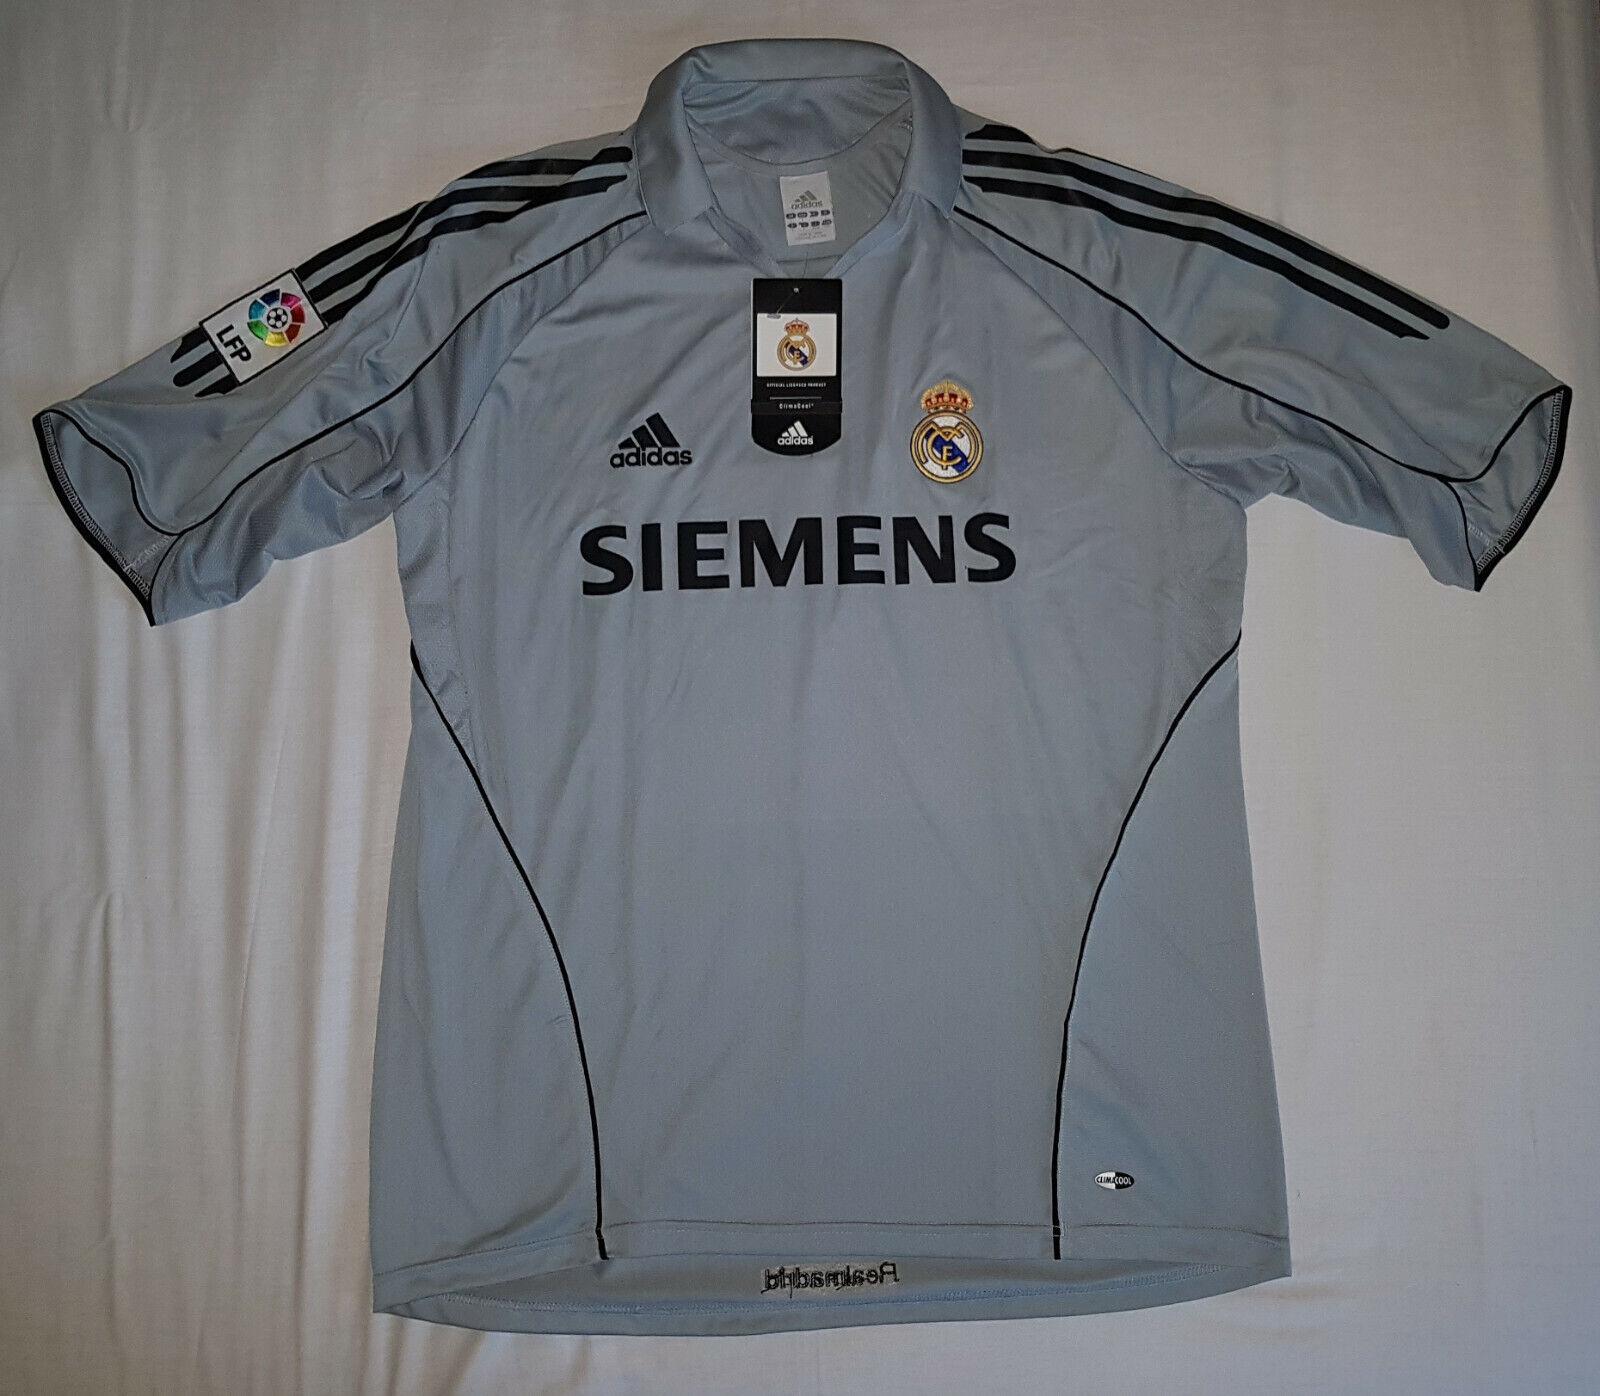 adidas donna soccer uniforms